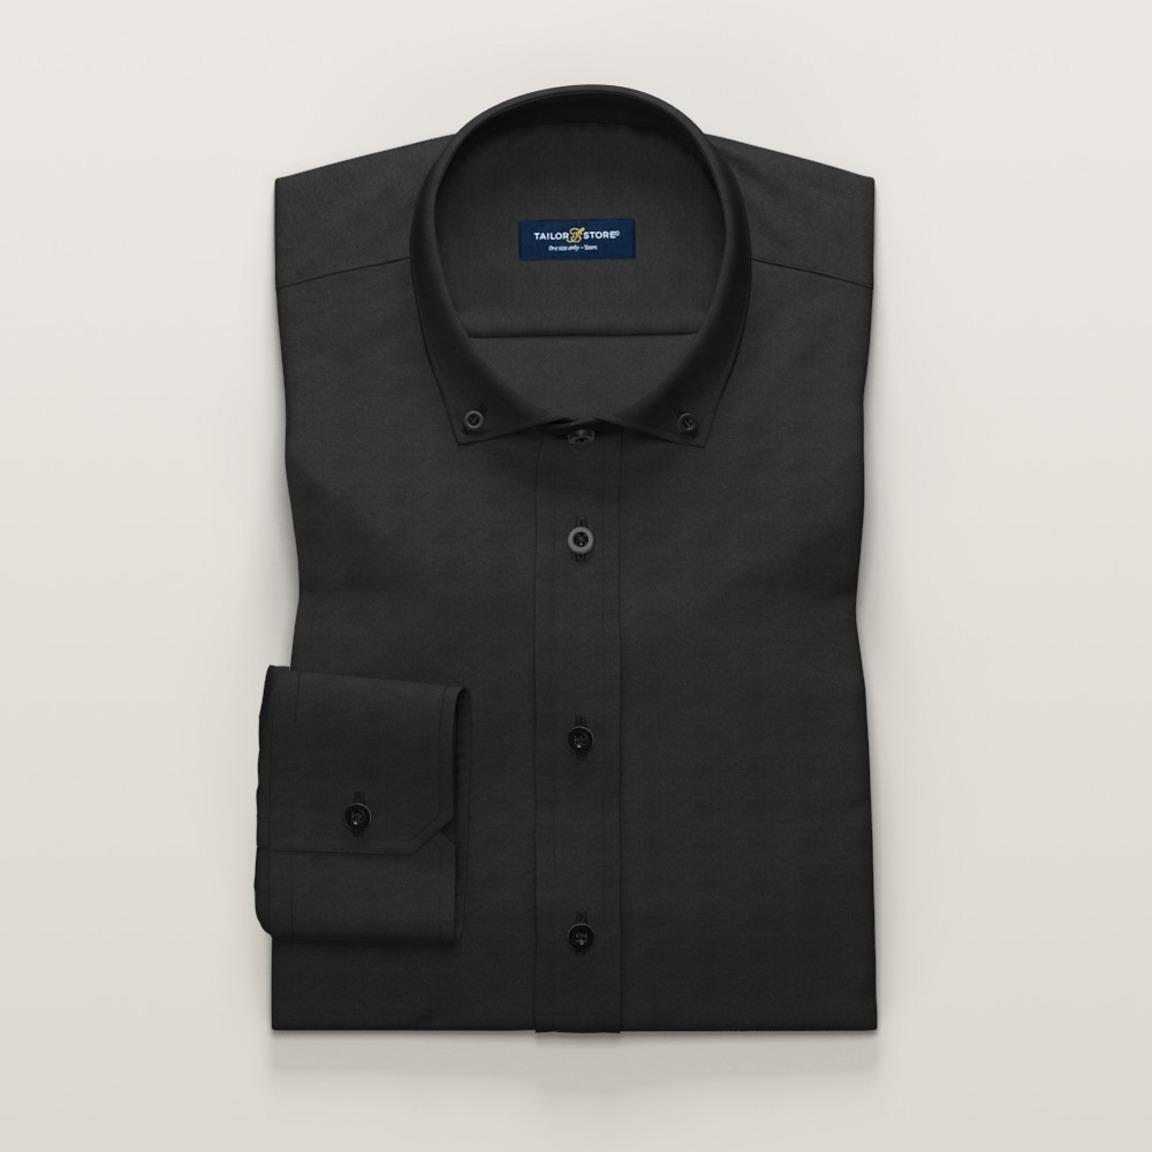 Matowa czarna koszula Oxford